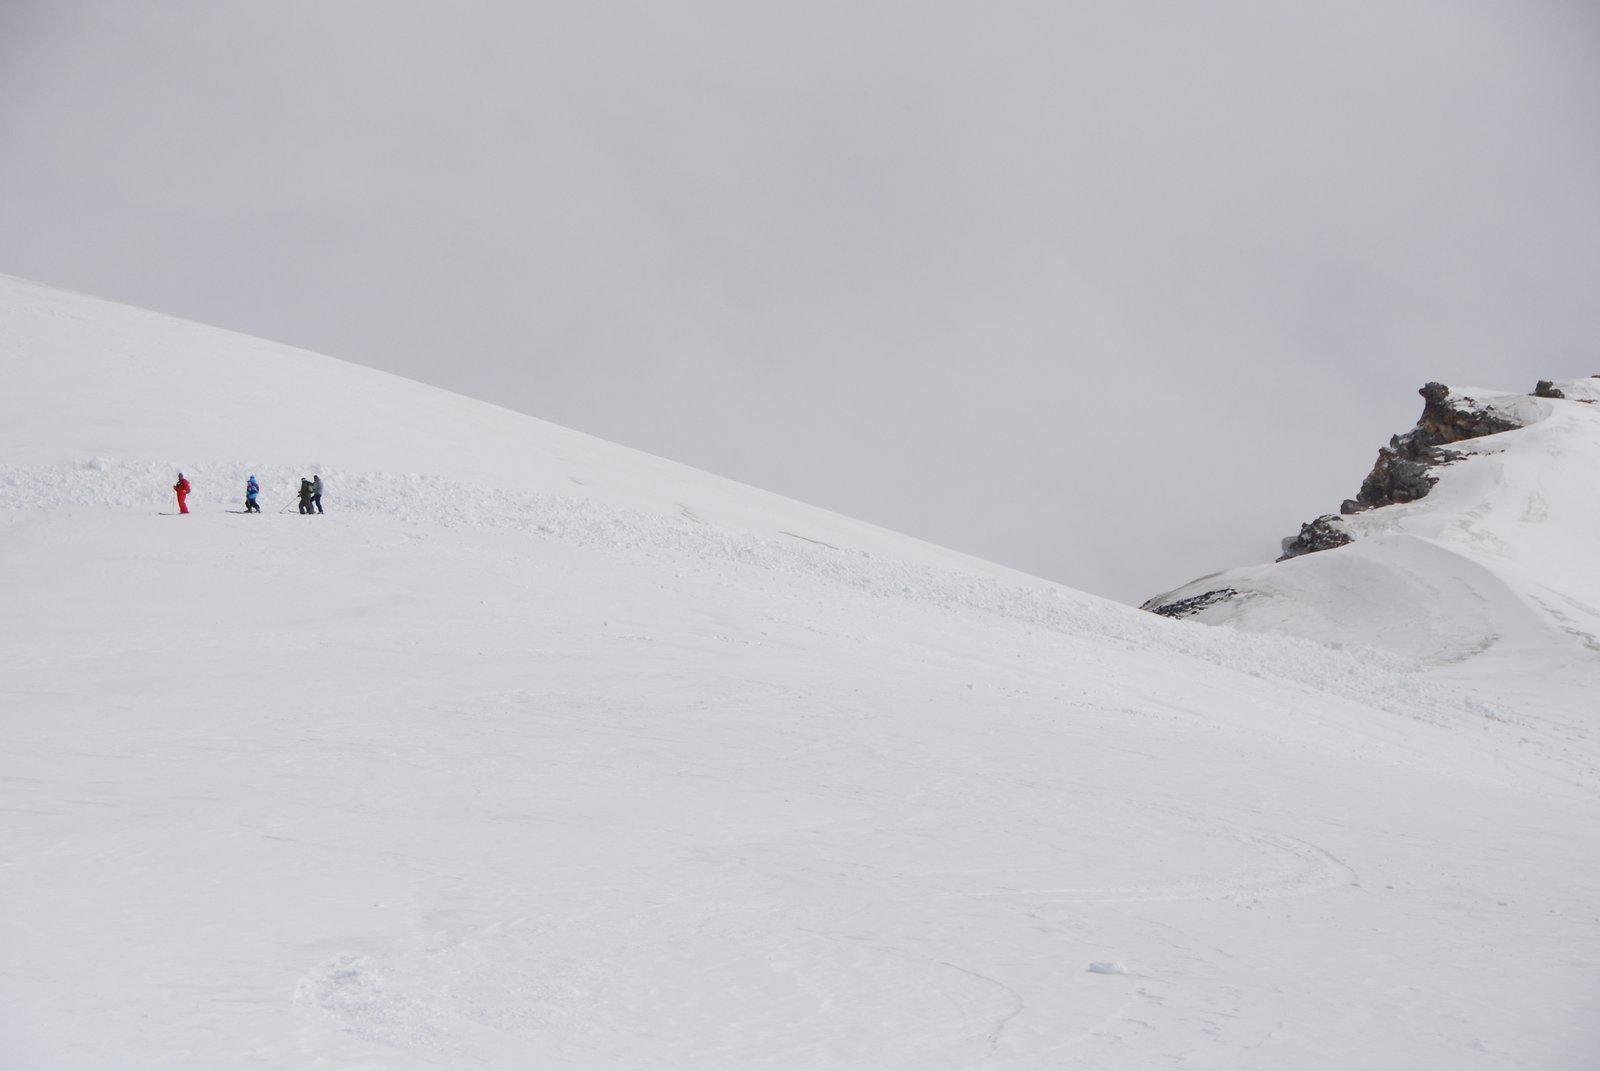 Tiny skiers